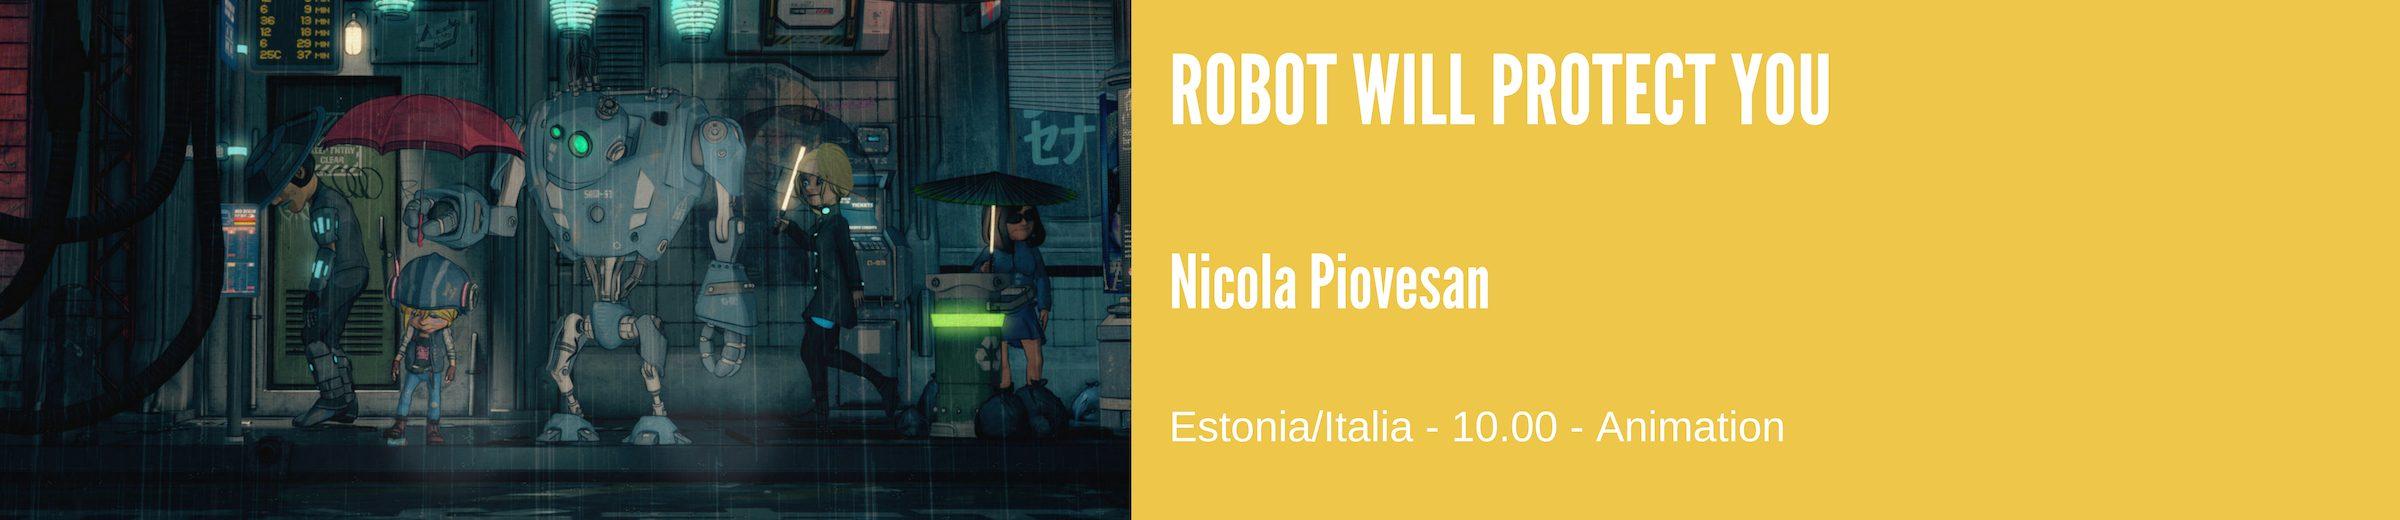 robot will